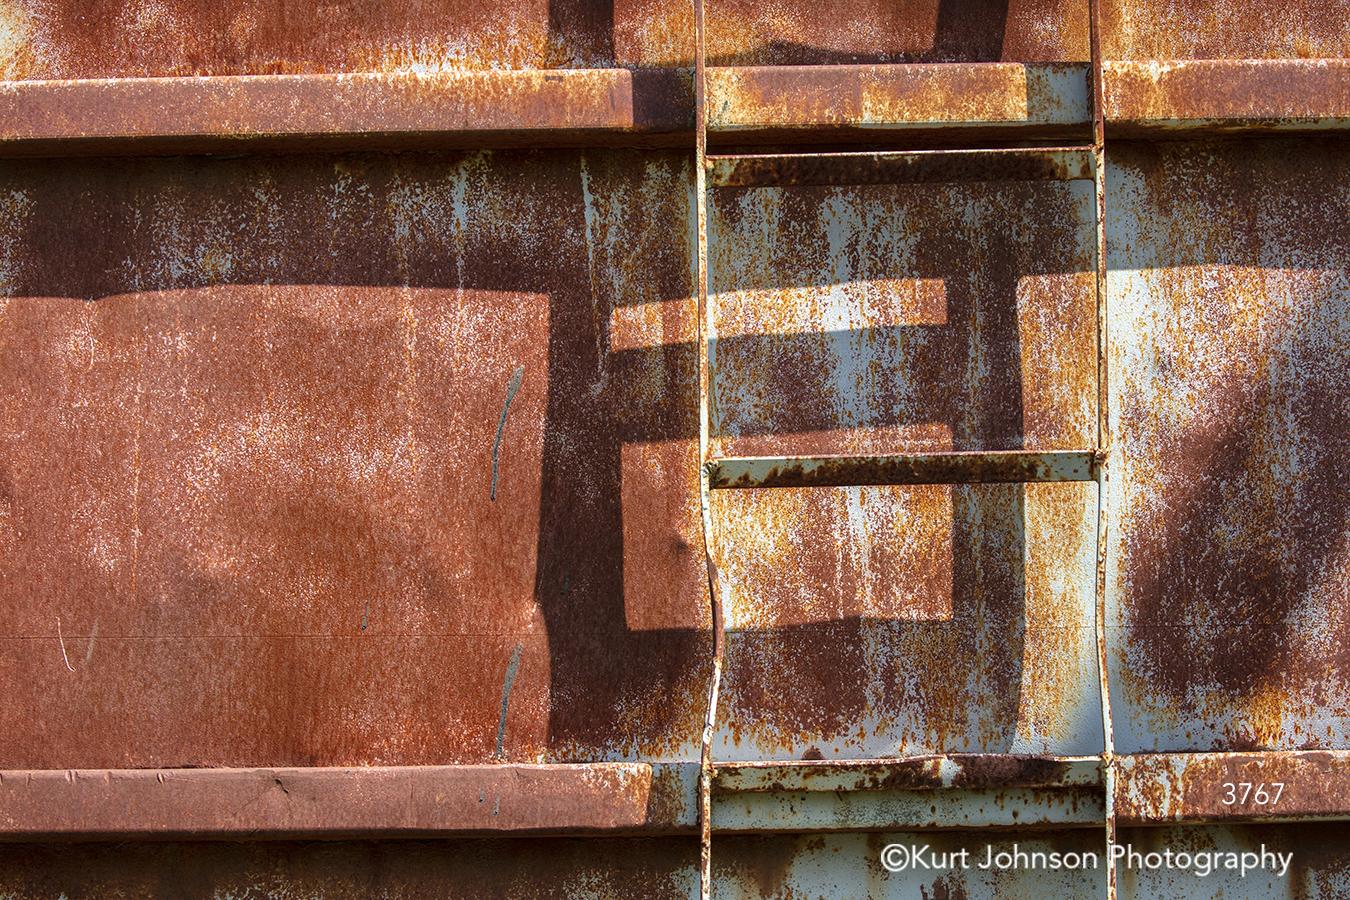 red orange brown rust texture pattern shadows lines